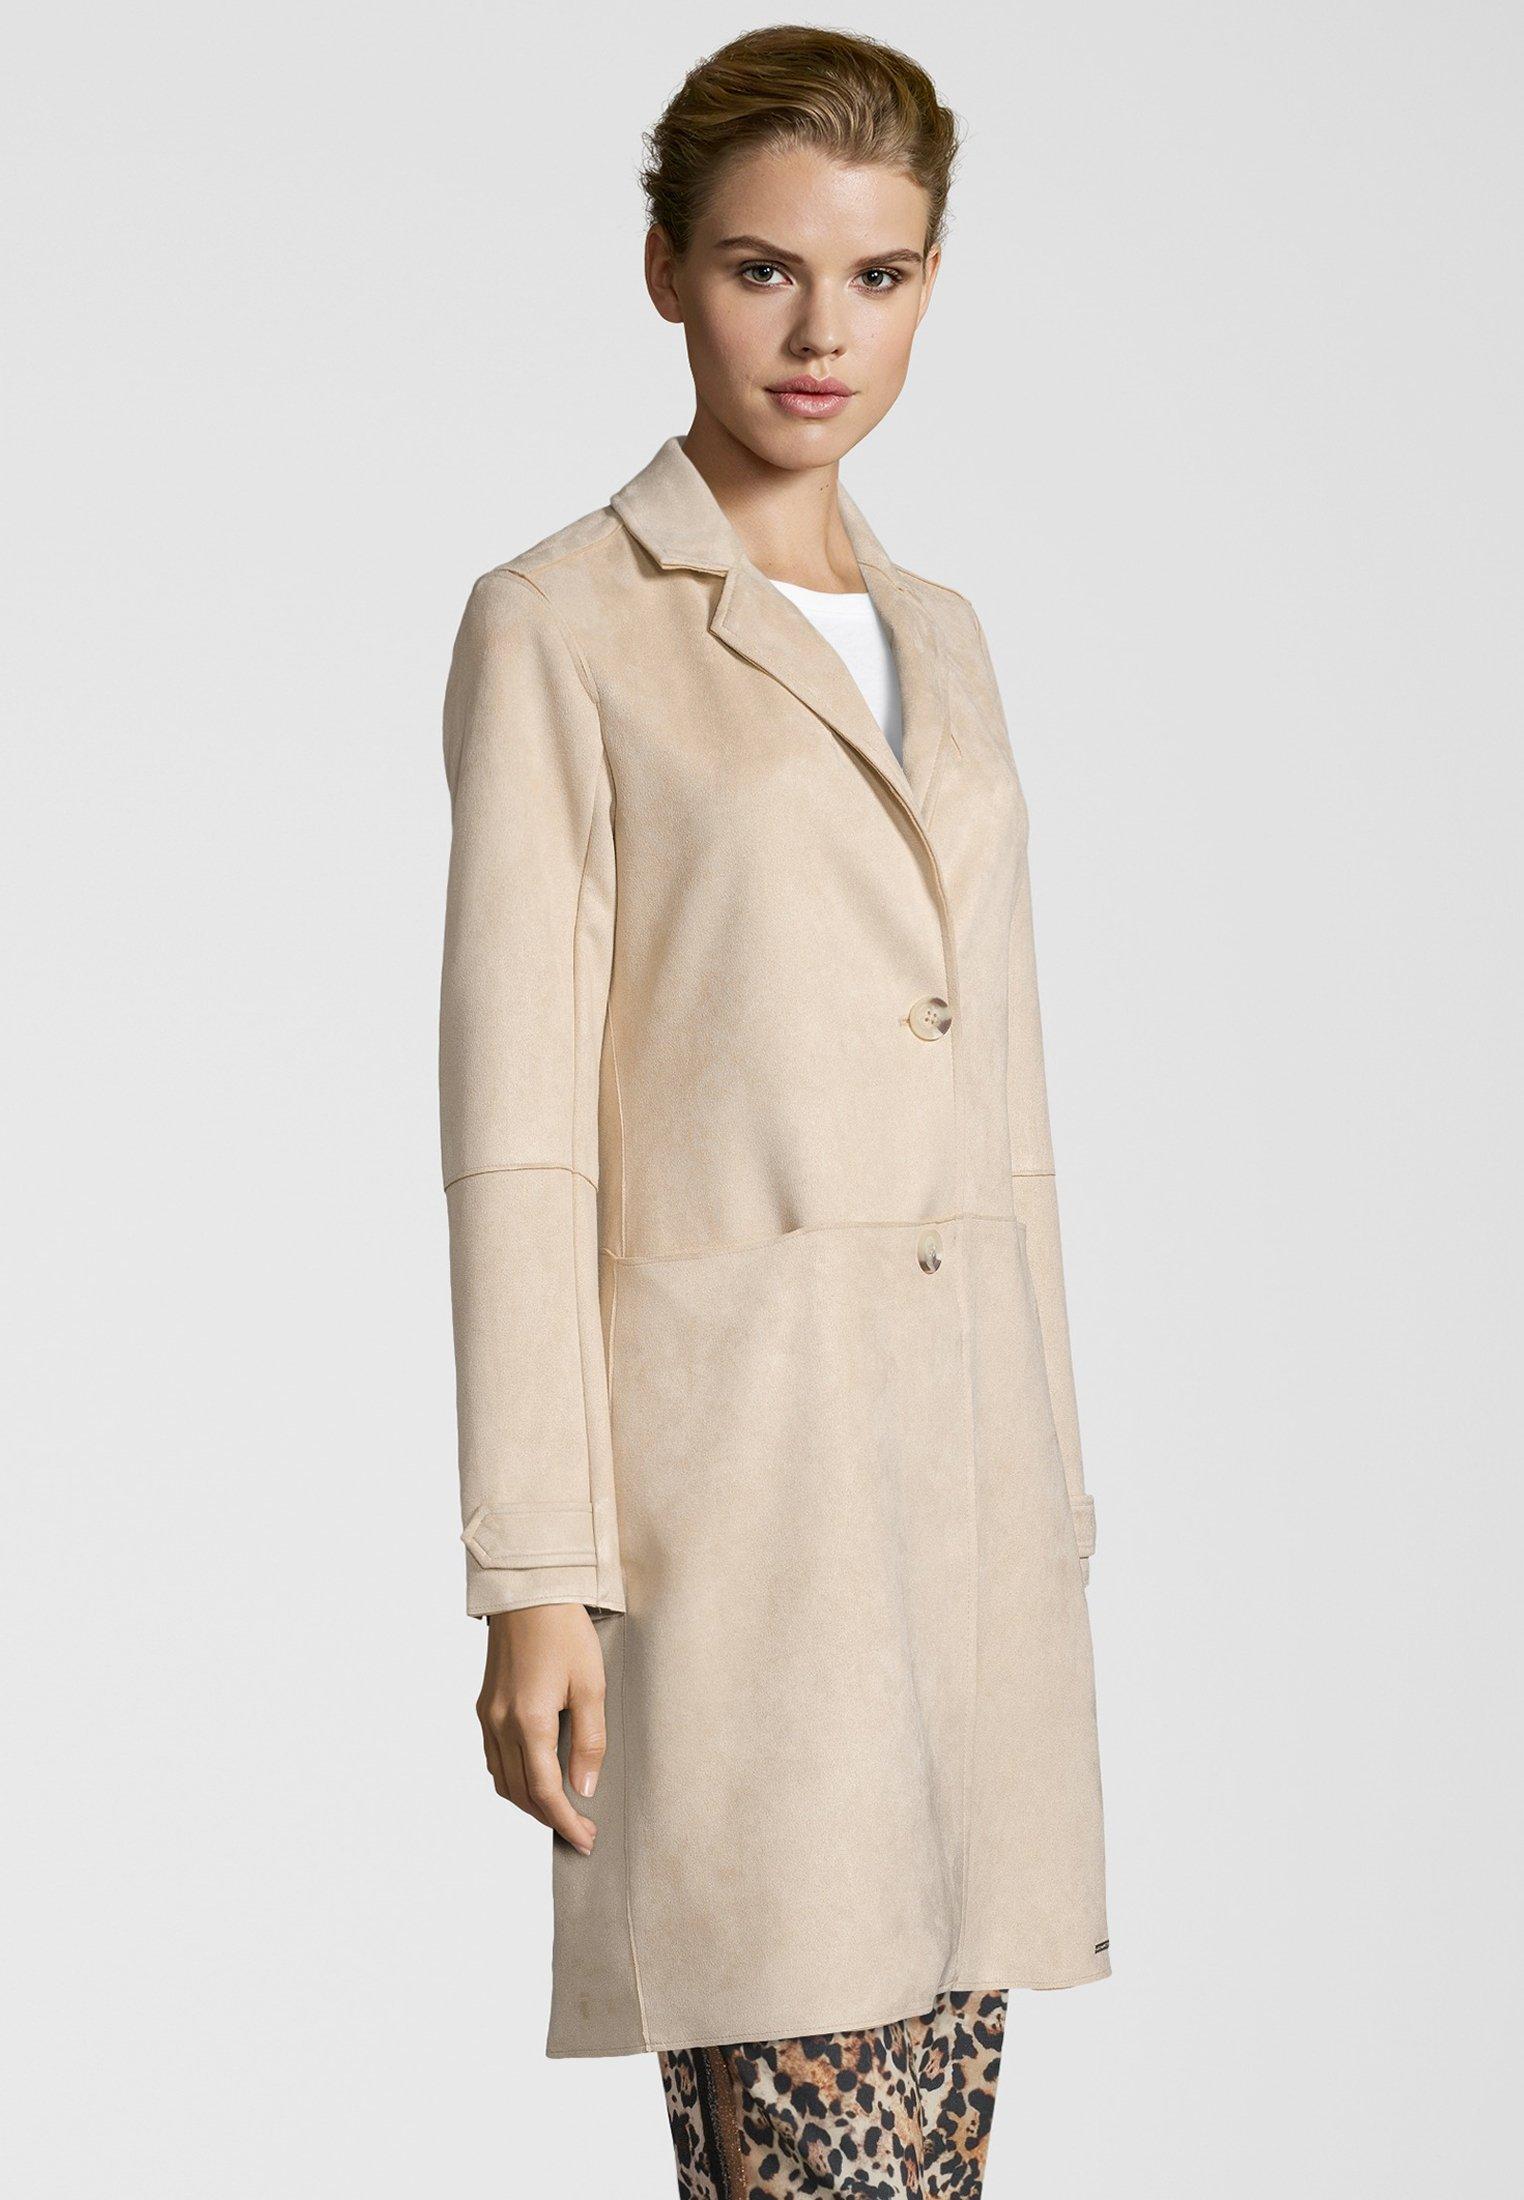 Rino&pelle Mantel Babice - Short Coat Sand